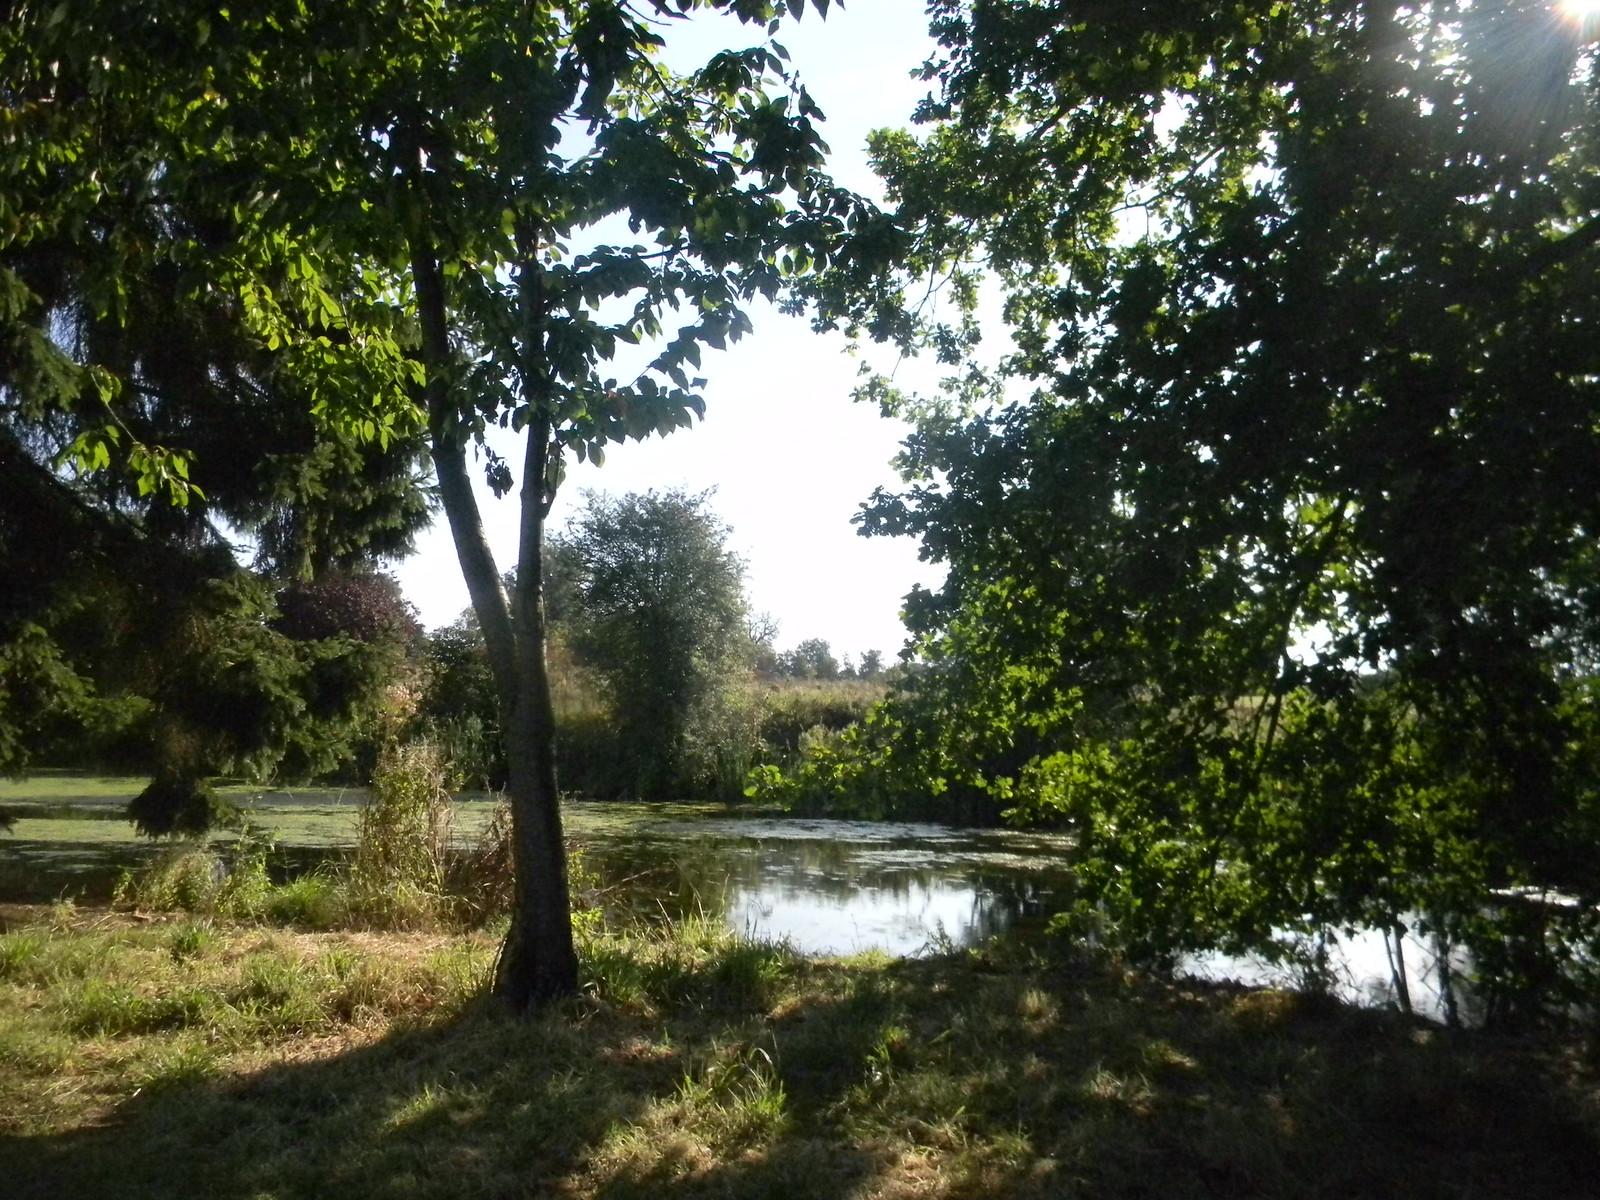 Along a watercourse The Wid? Roydon to Sawbridgeworth